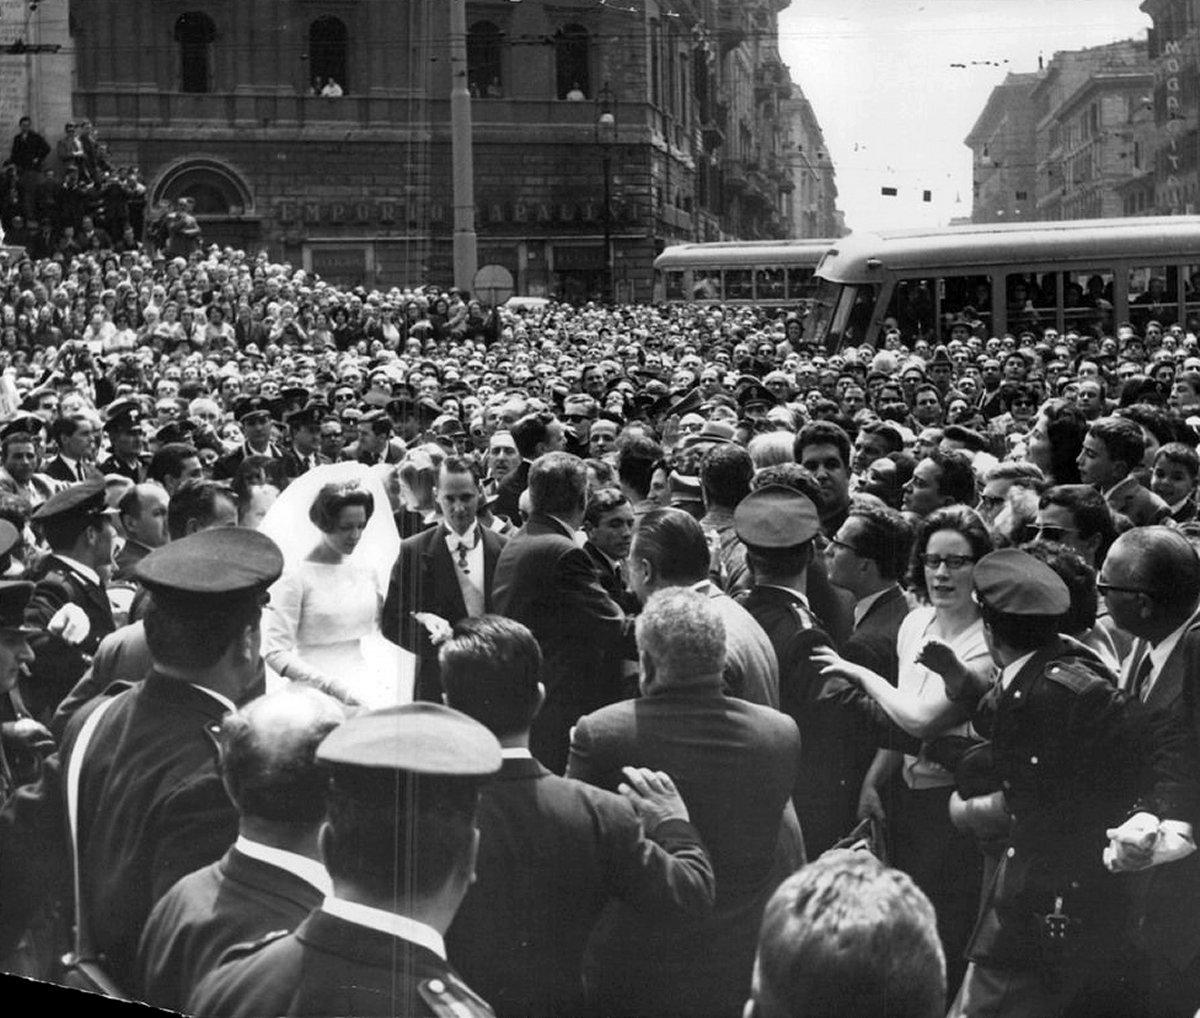 Princess Irene of the Netherlands marries Prince Carlos Hugo of Bourbon-Parma, Apr 1964